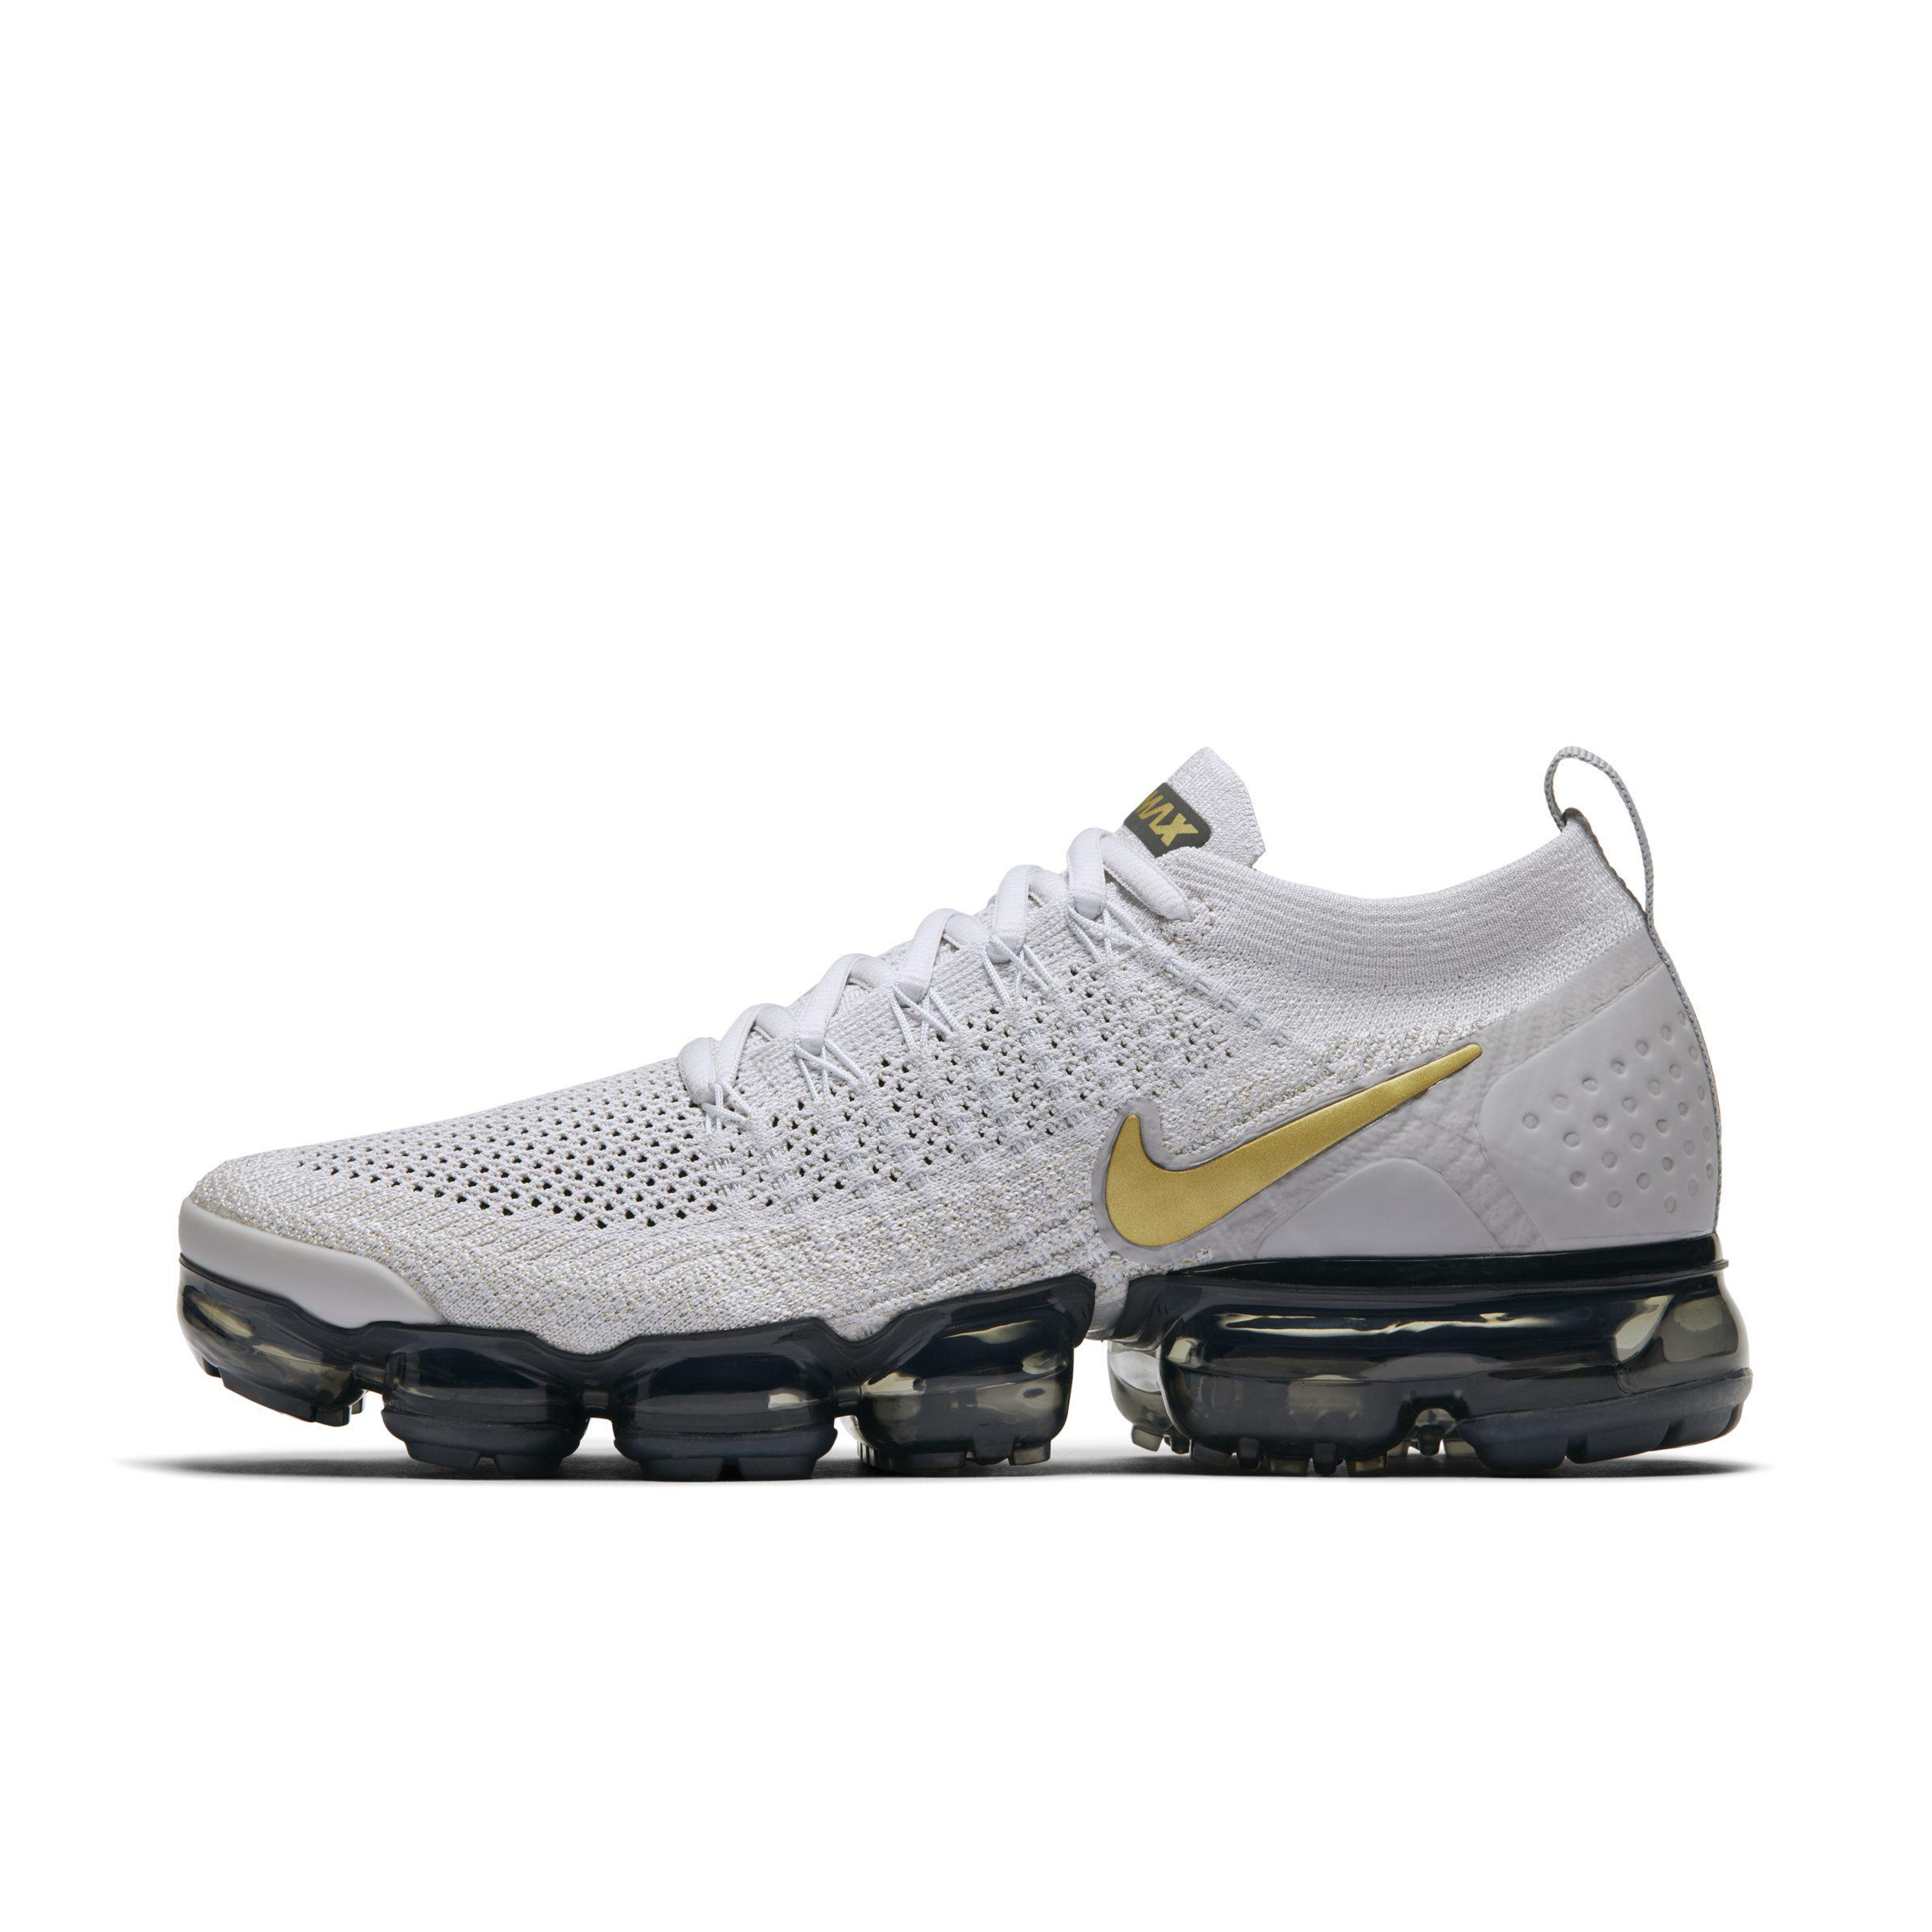 Nike Air Vapormax Flyknit 2 Shoe in Gray - Lyst 630676f3a366